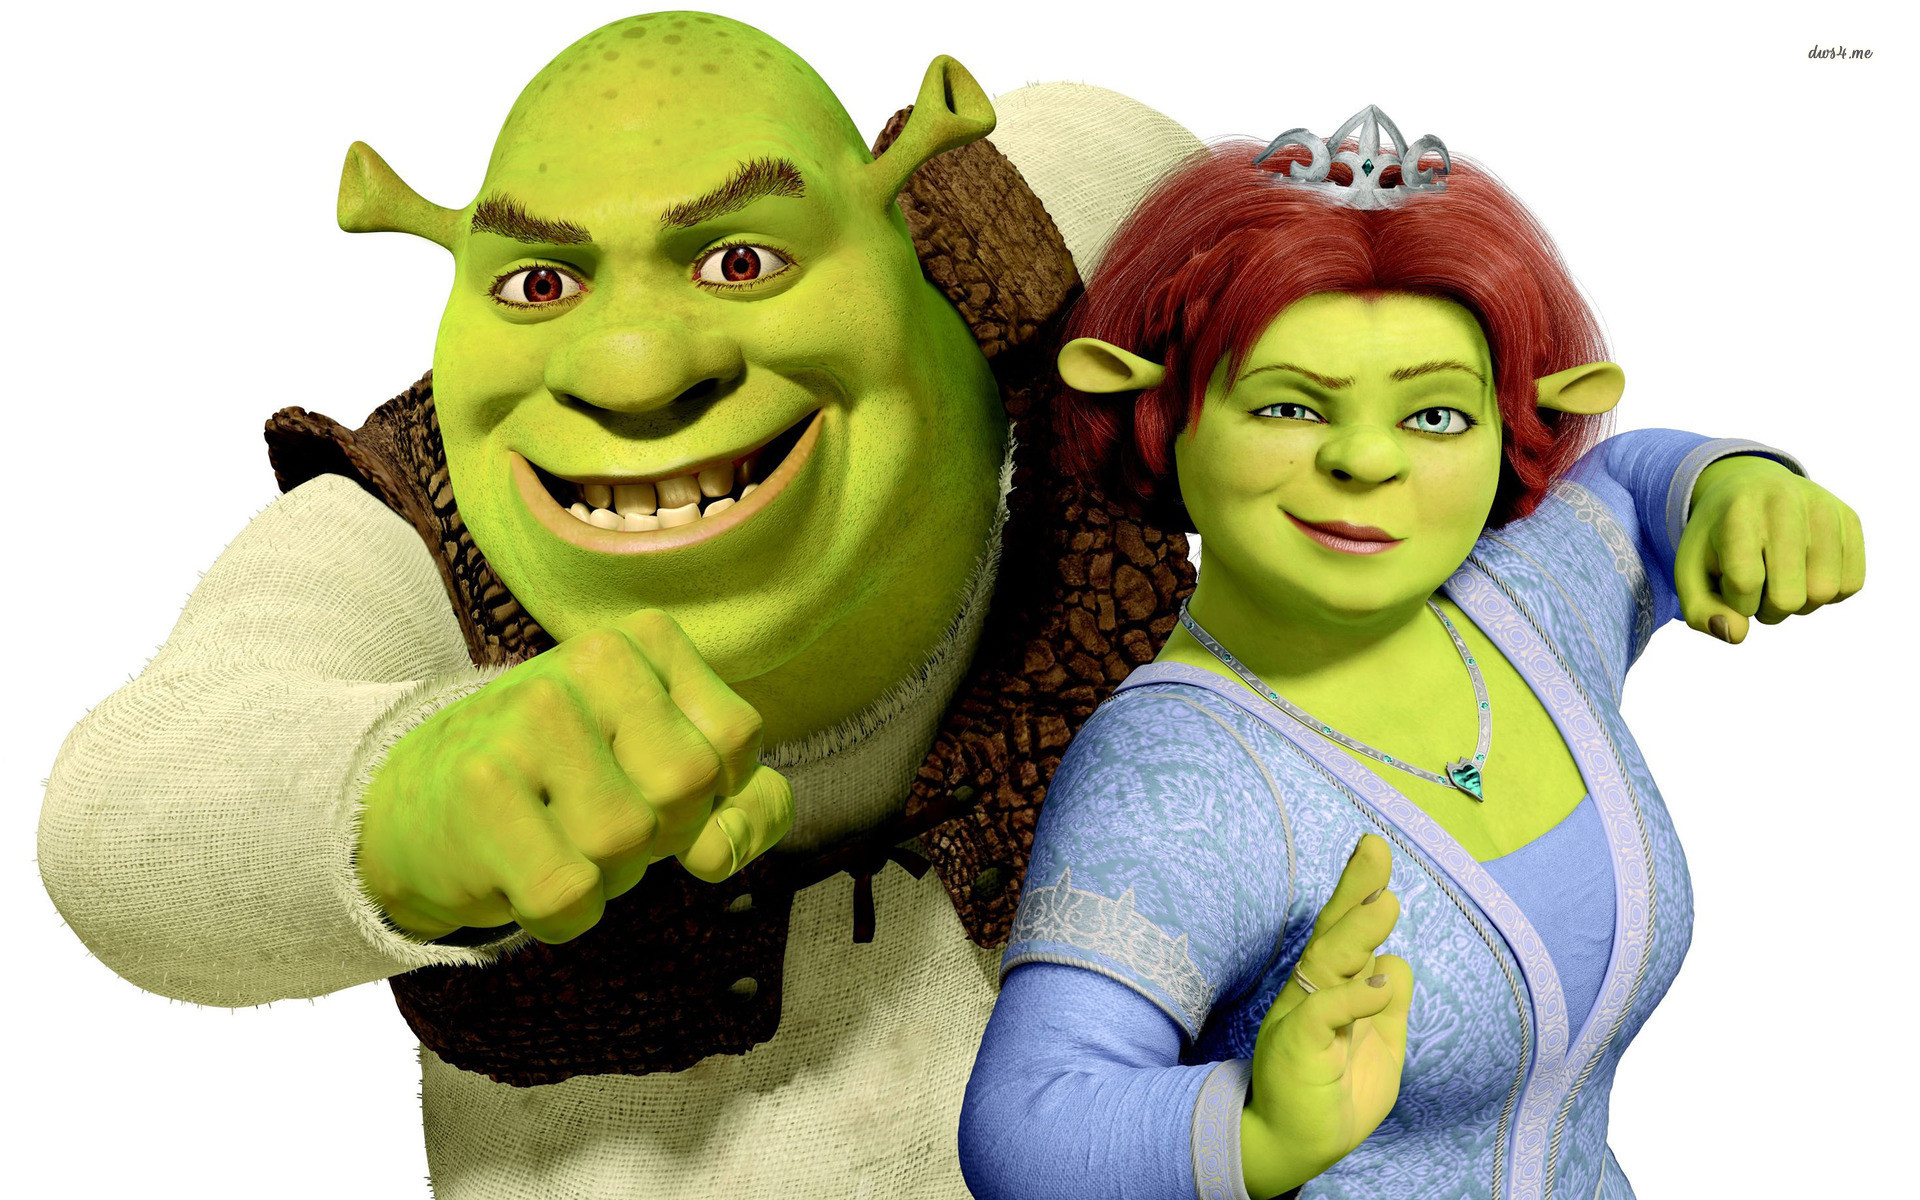 Shrek and Princess Fiona wallpaper – Cartoon wallpapers – #7119